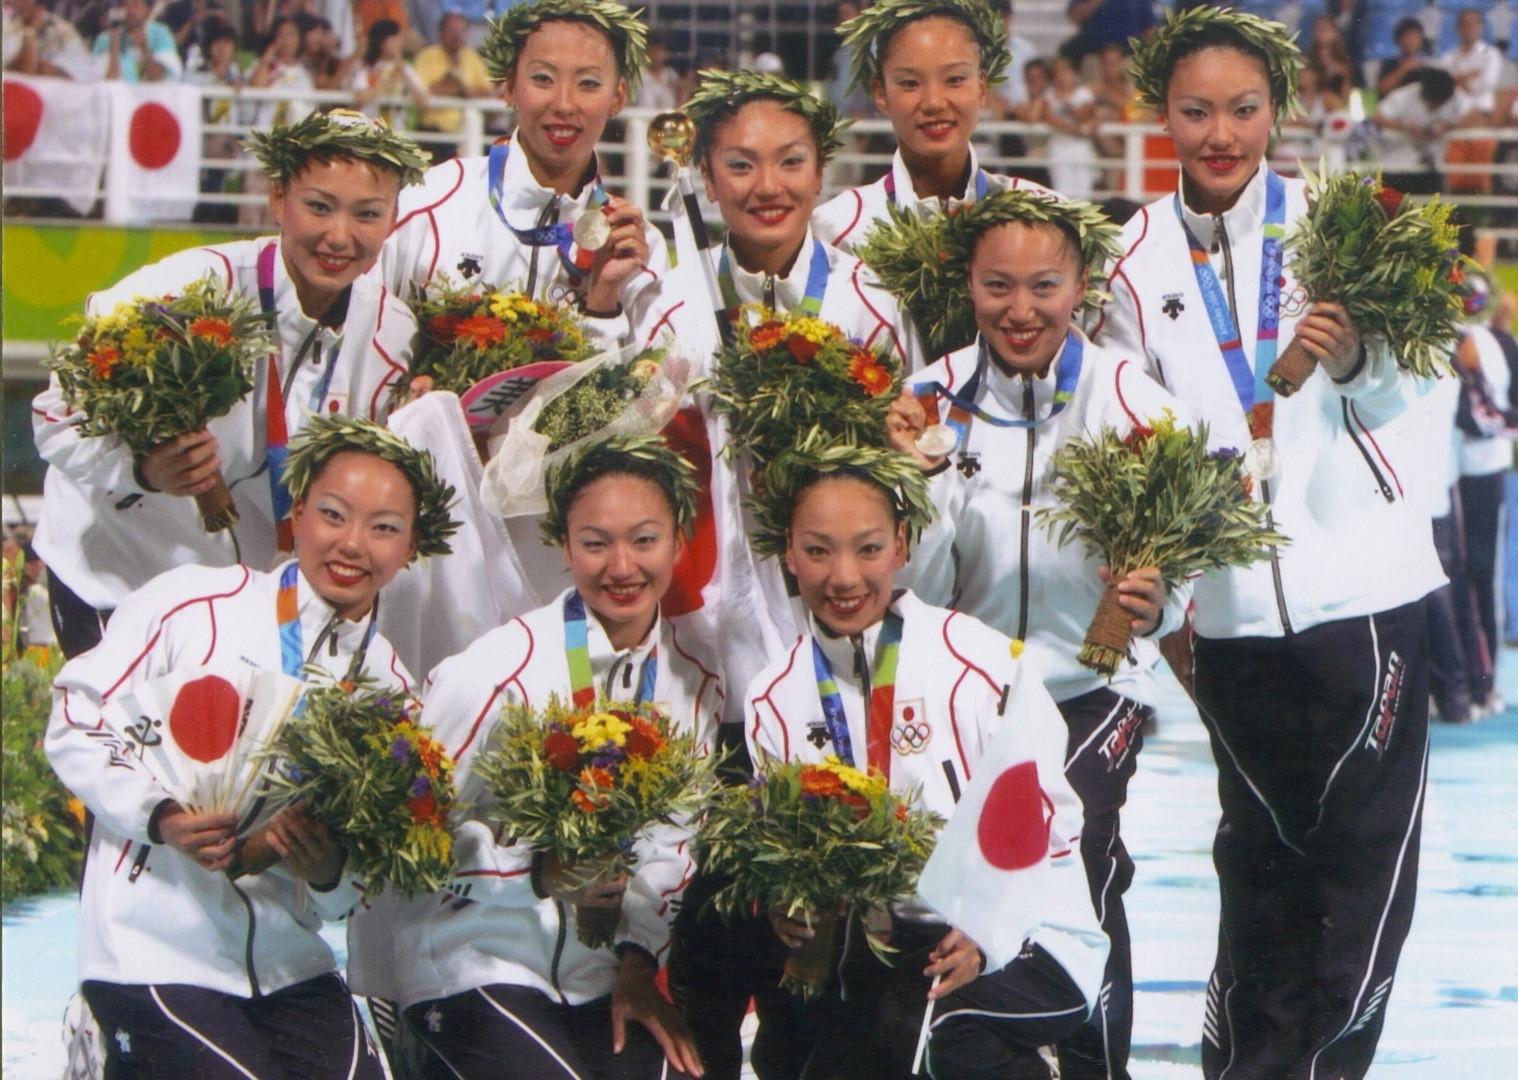 2004 Olympic